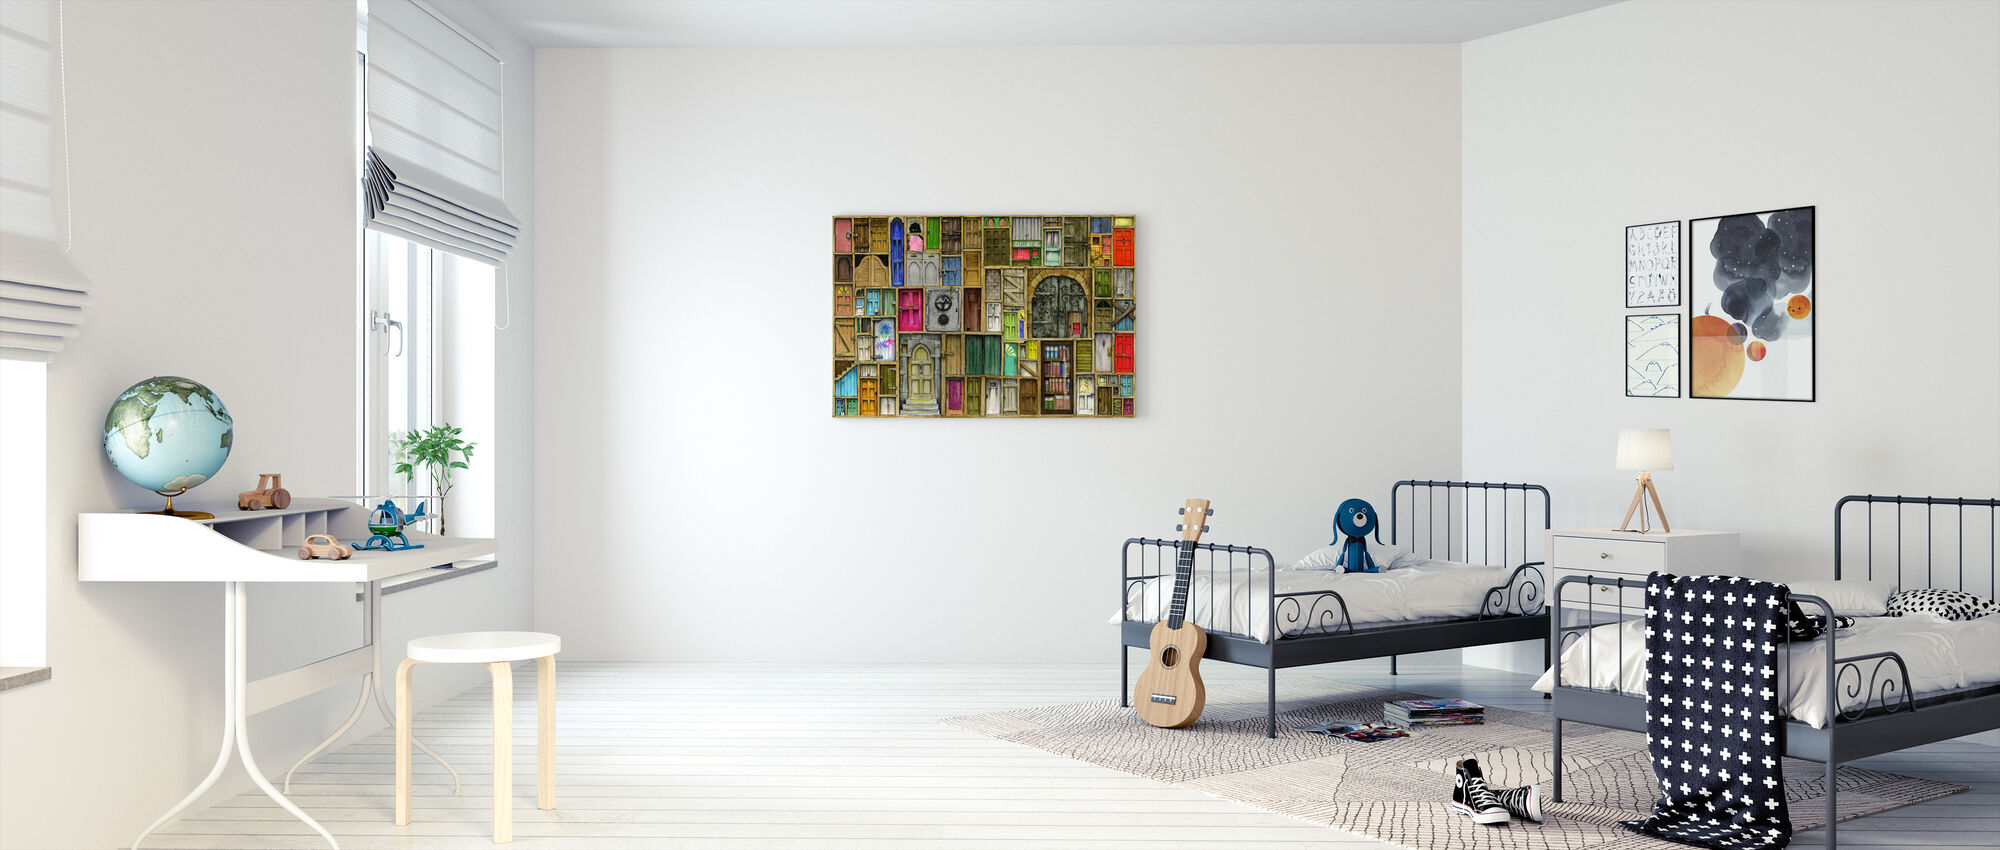 Doors Closed - Canvas print - Kids Room